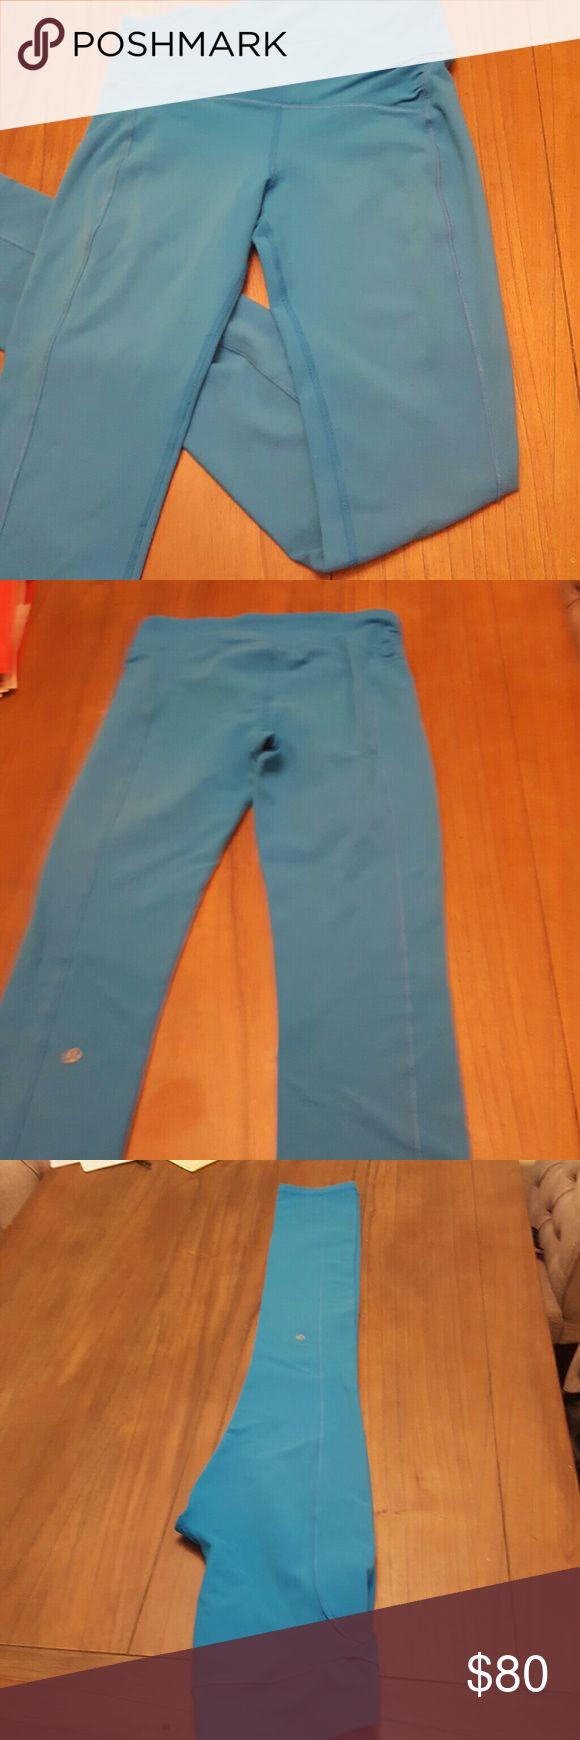 Lululemin workout leggings Bright blue Lululemon leggings lululemon athletica Pants Leggings